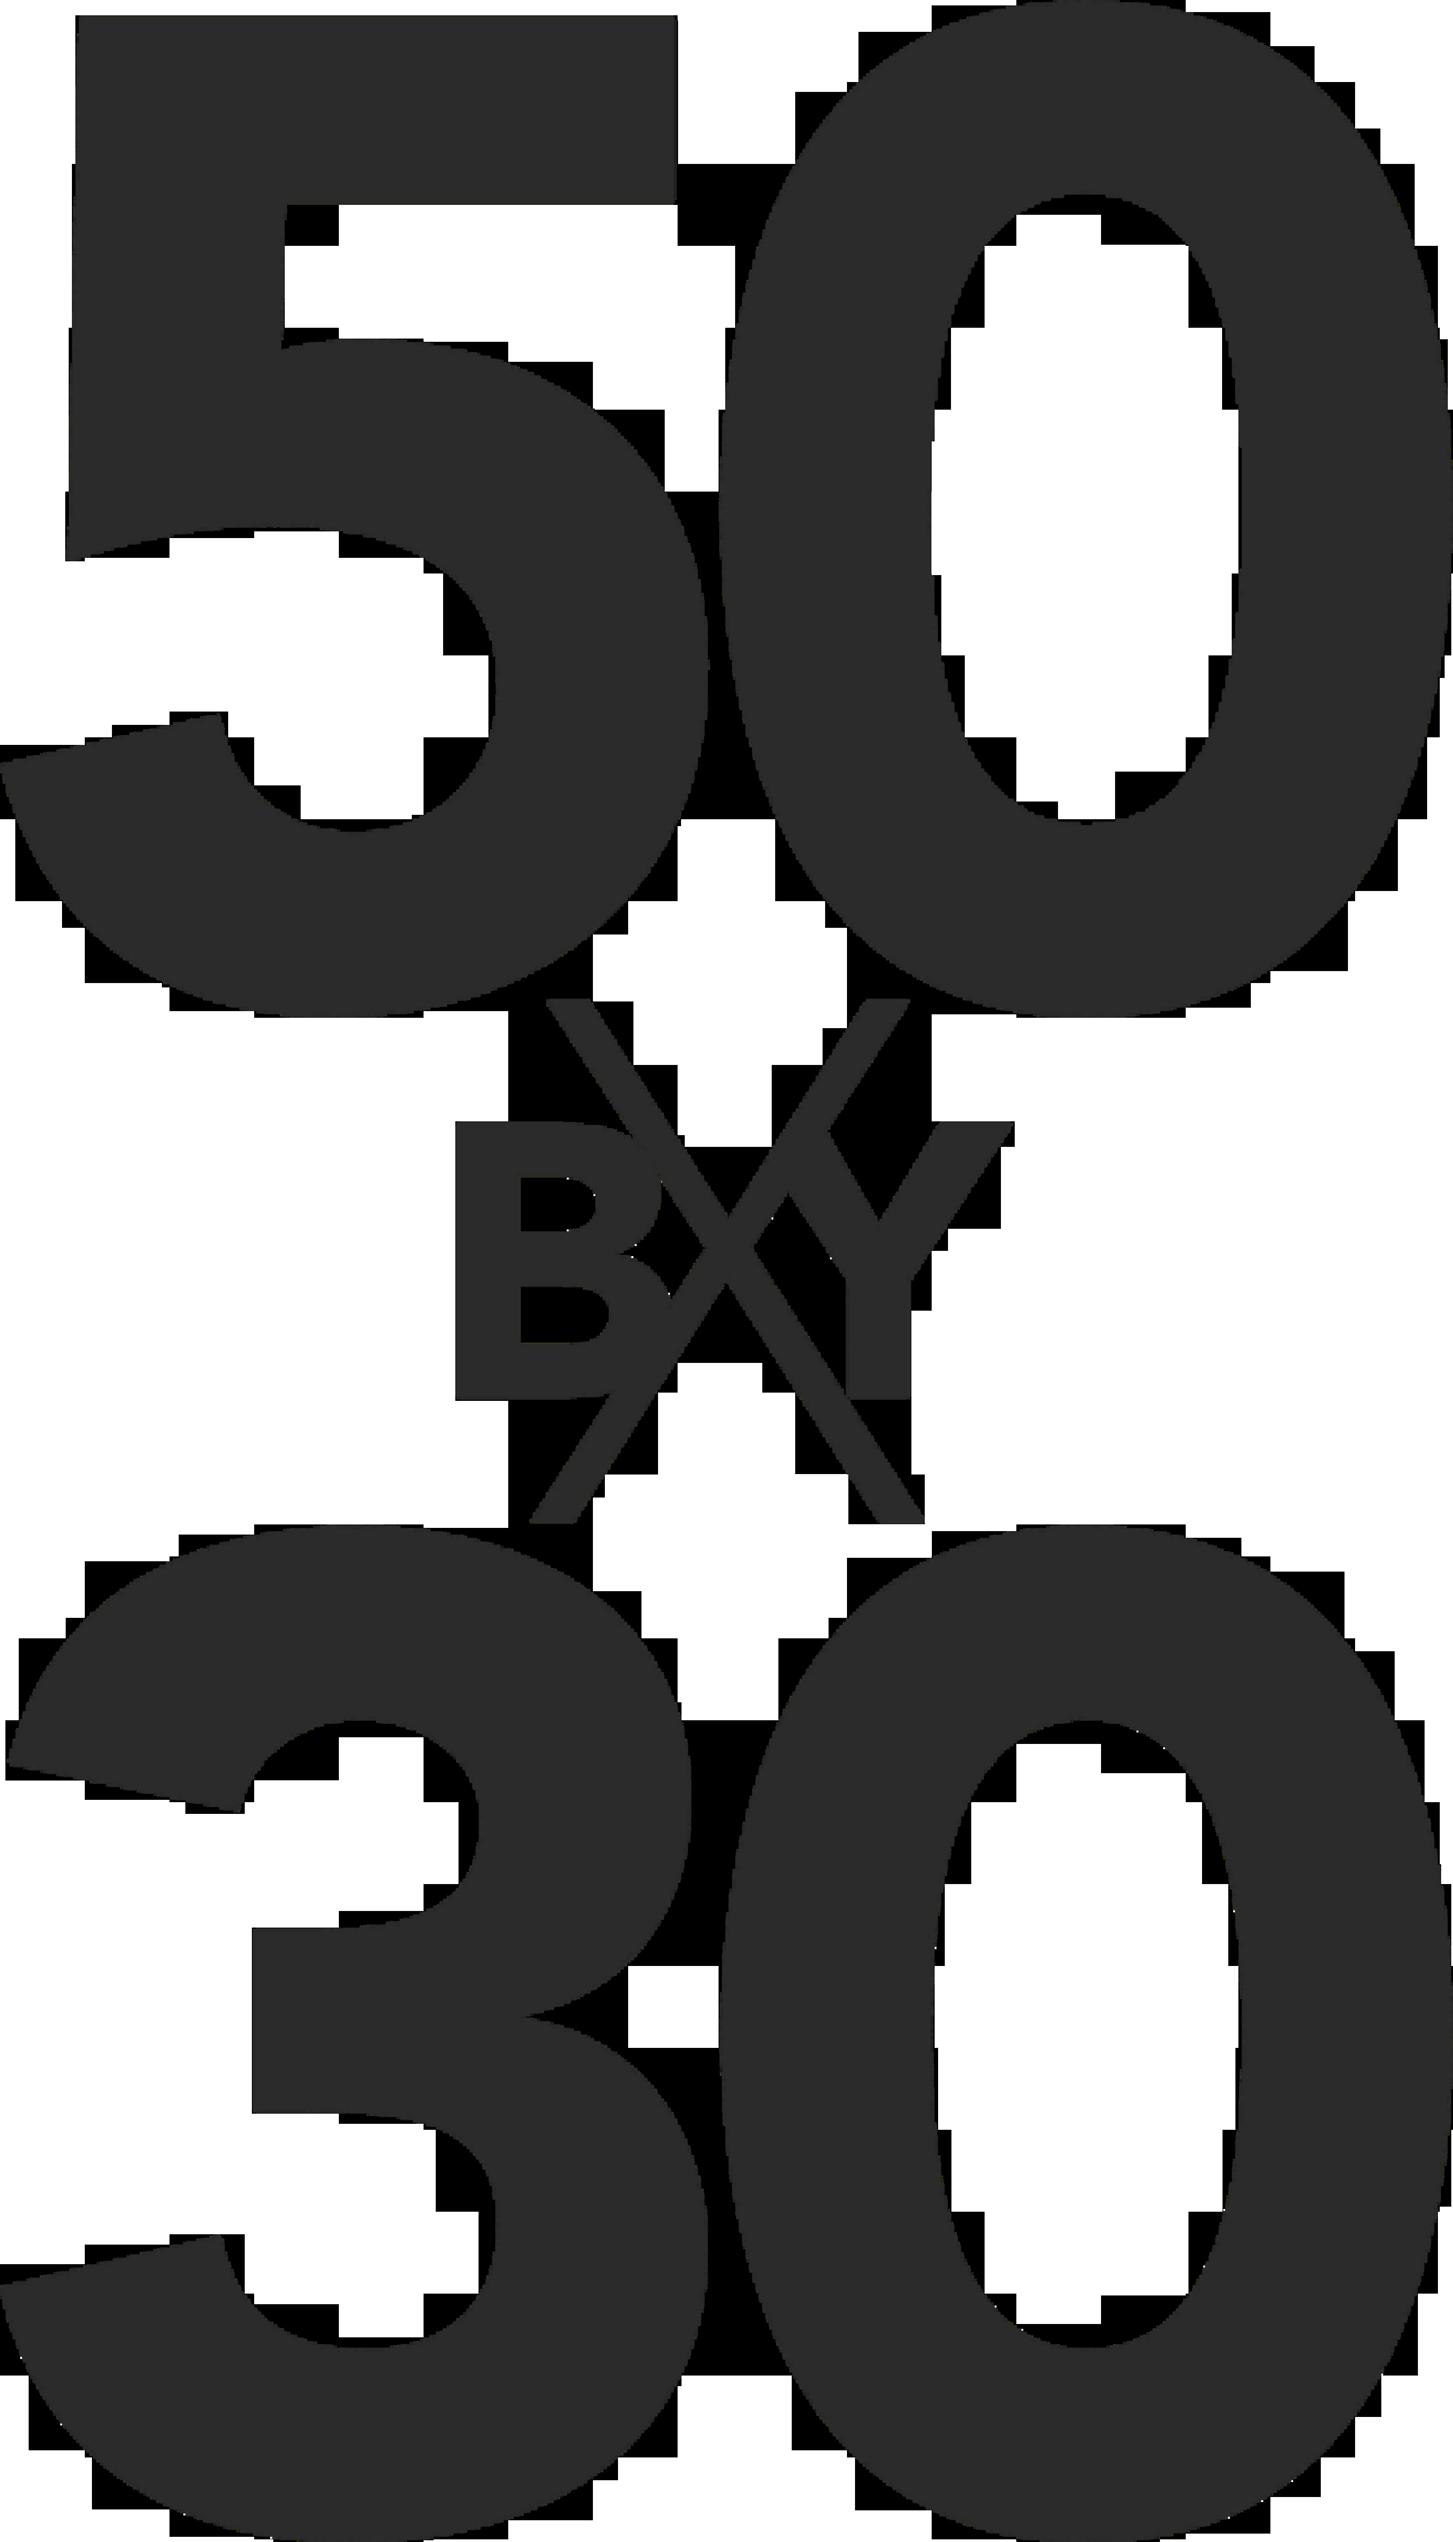 50x30